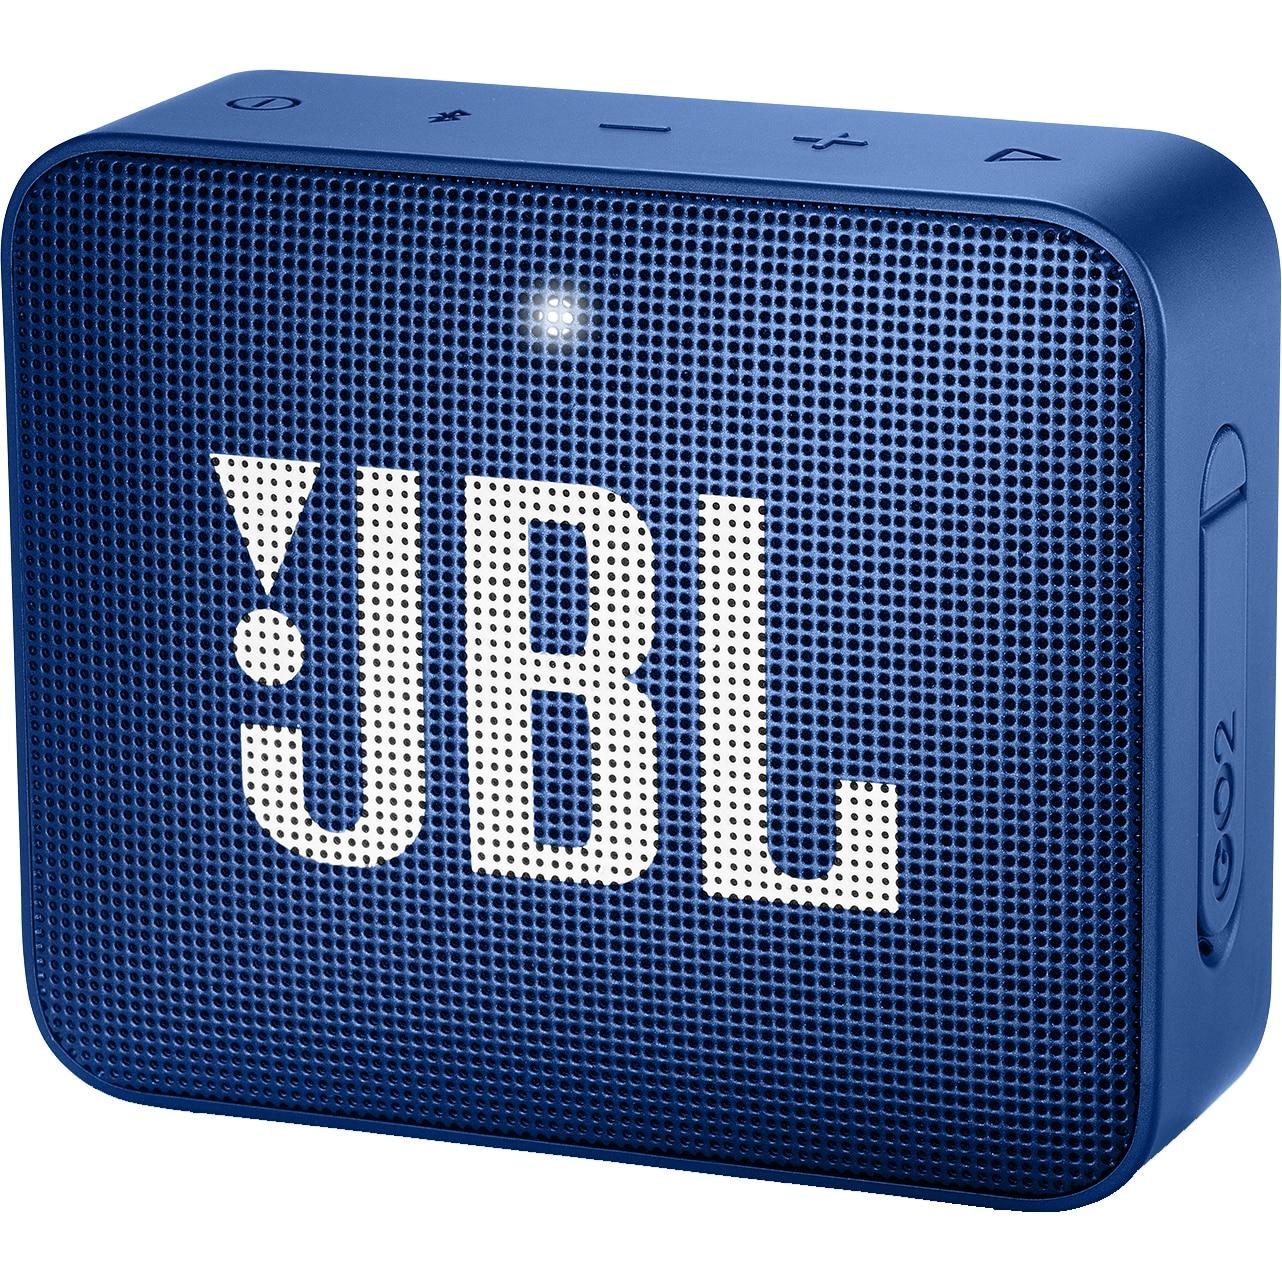 Fotografie Boxa portabila JBL Go2, IPX7, albastru